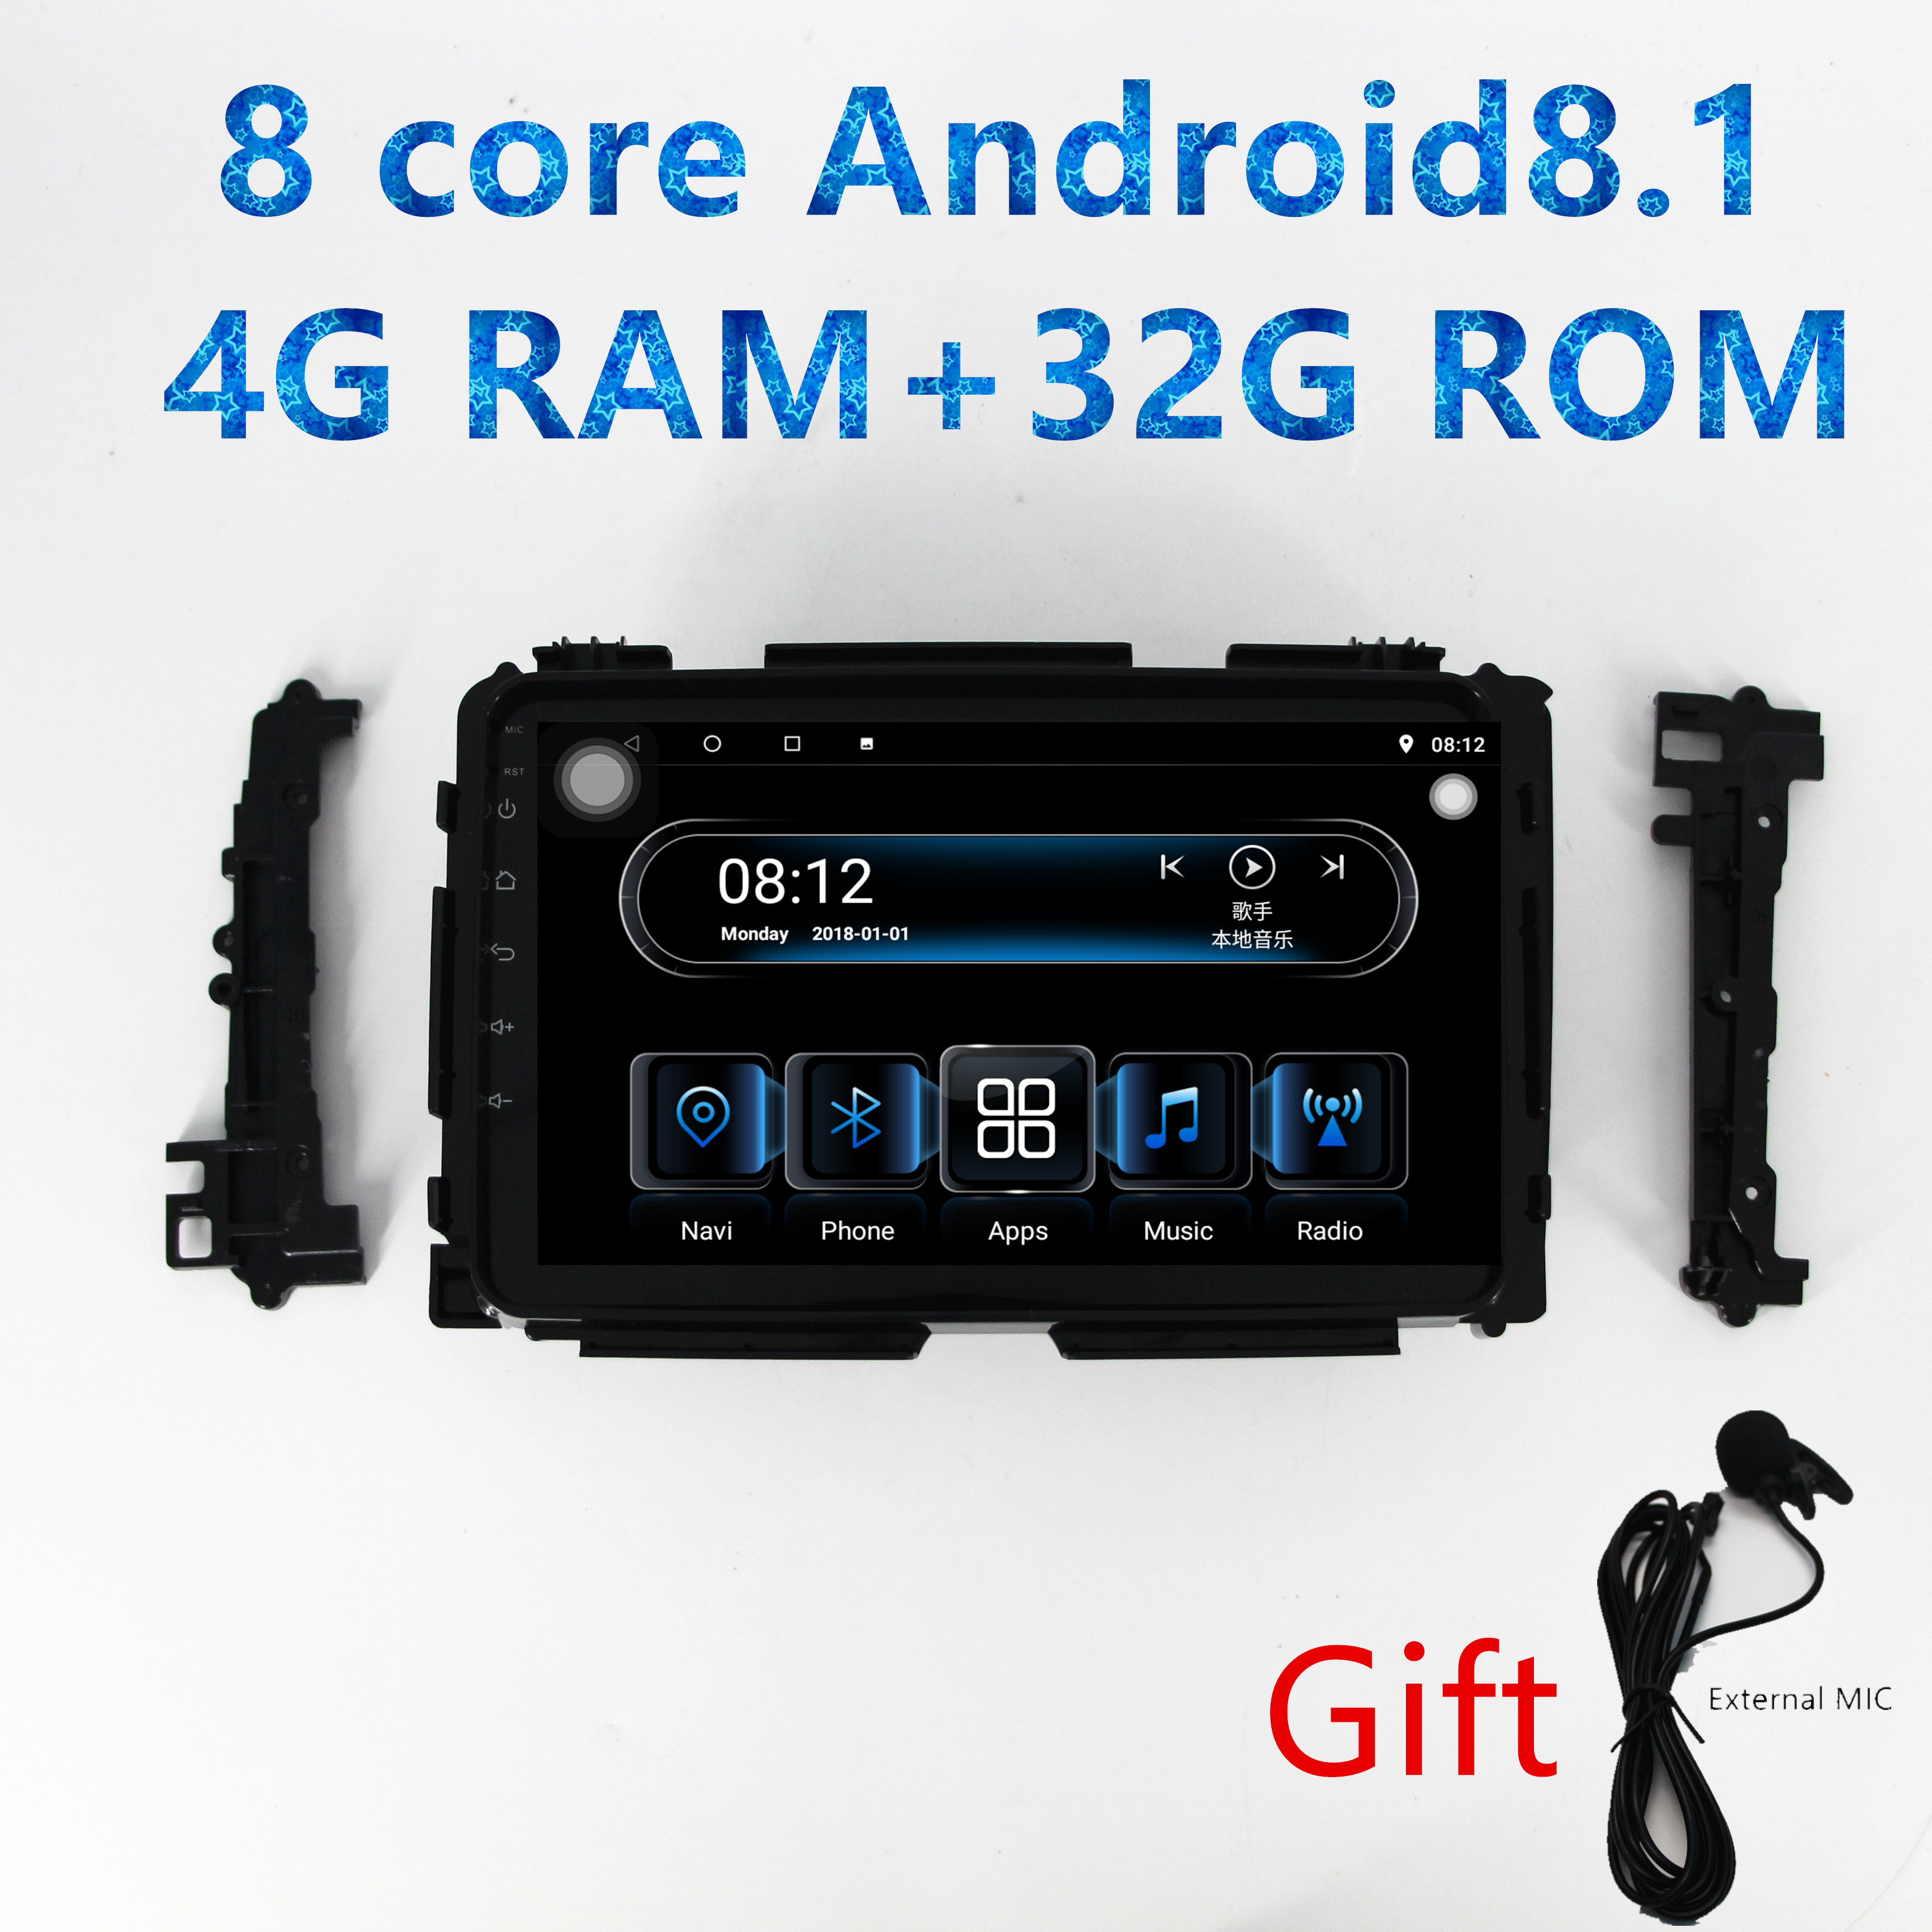 Dasaita Android 9.0 Car Stereo for Honda Vezel HR-V HRV 2014 2015 2016 2017 Gps Navigation Radio with 9 Inch Screen 4G Ram Head Unit